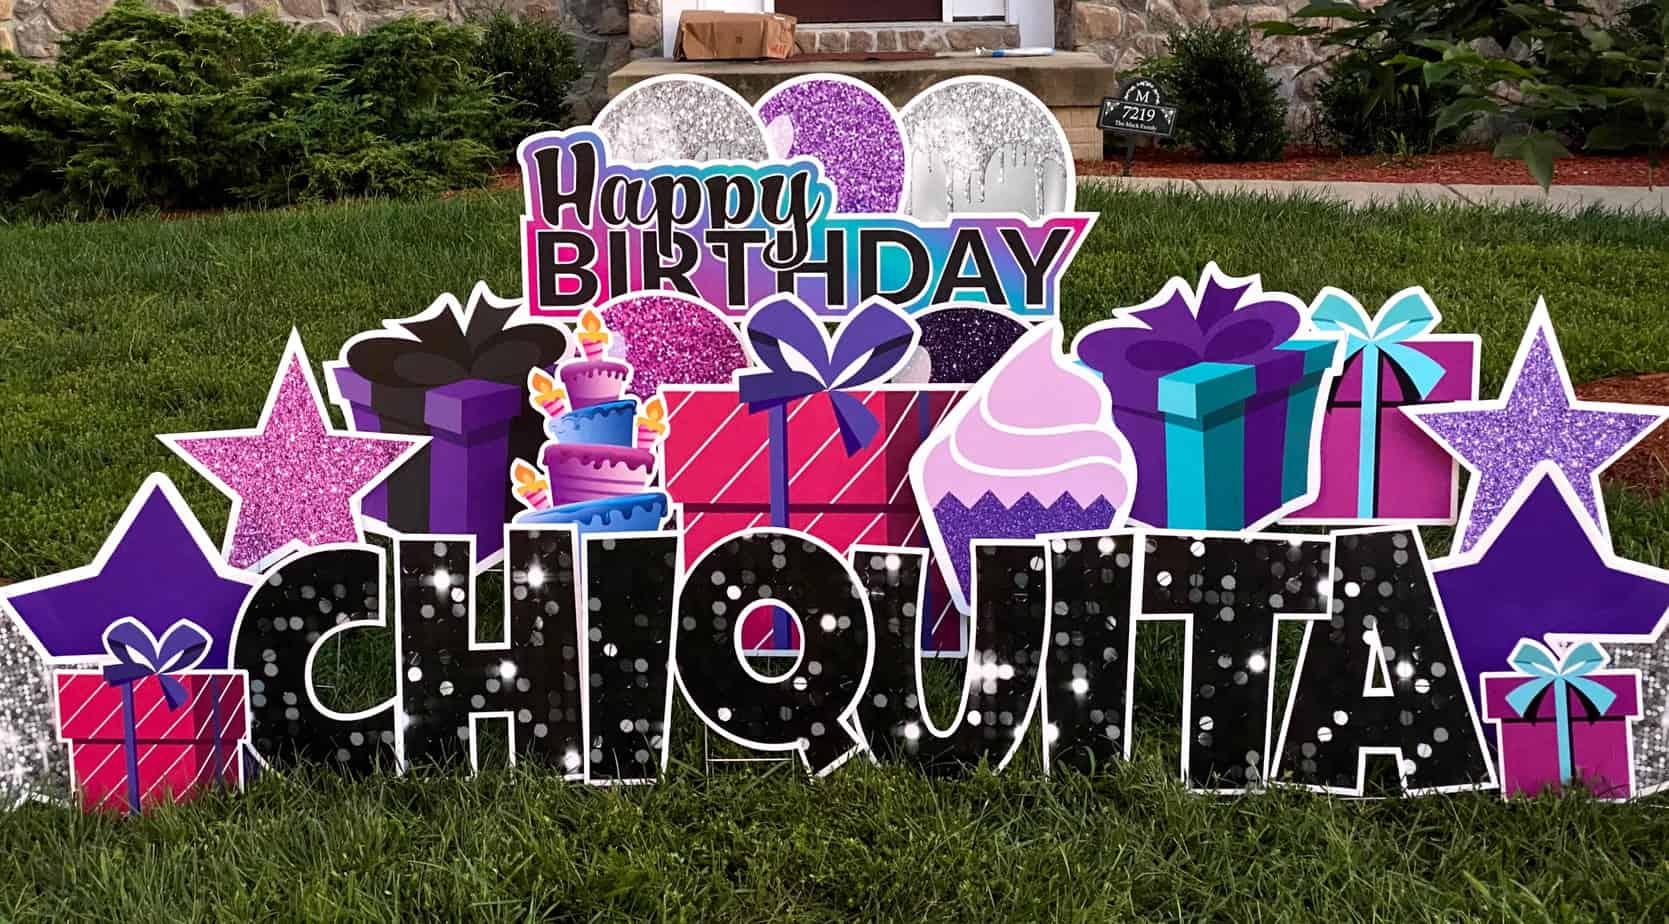 happy birthday yard greeting springfield VA